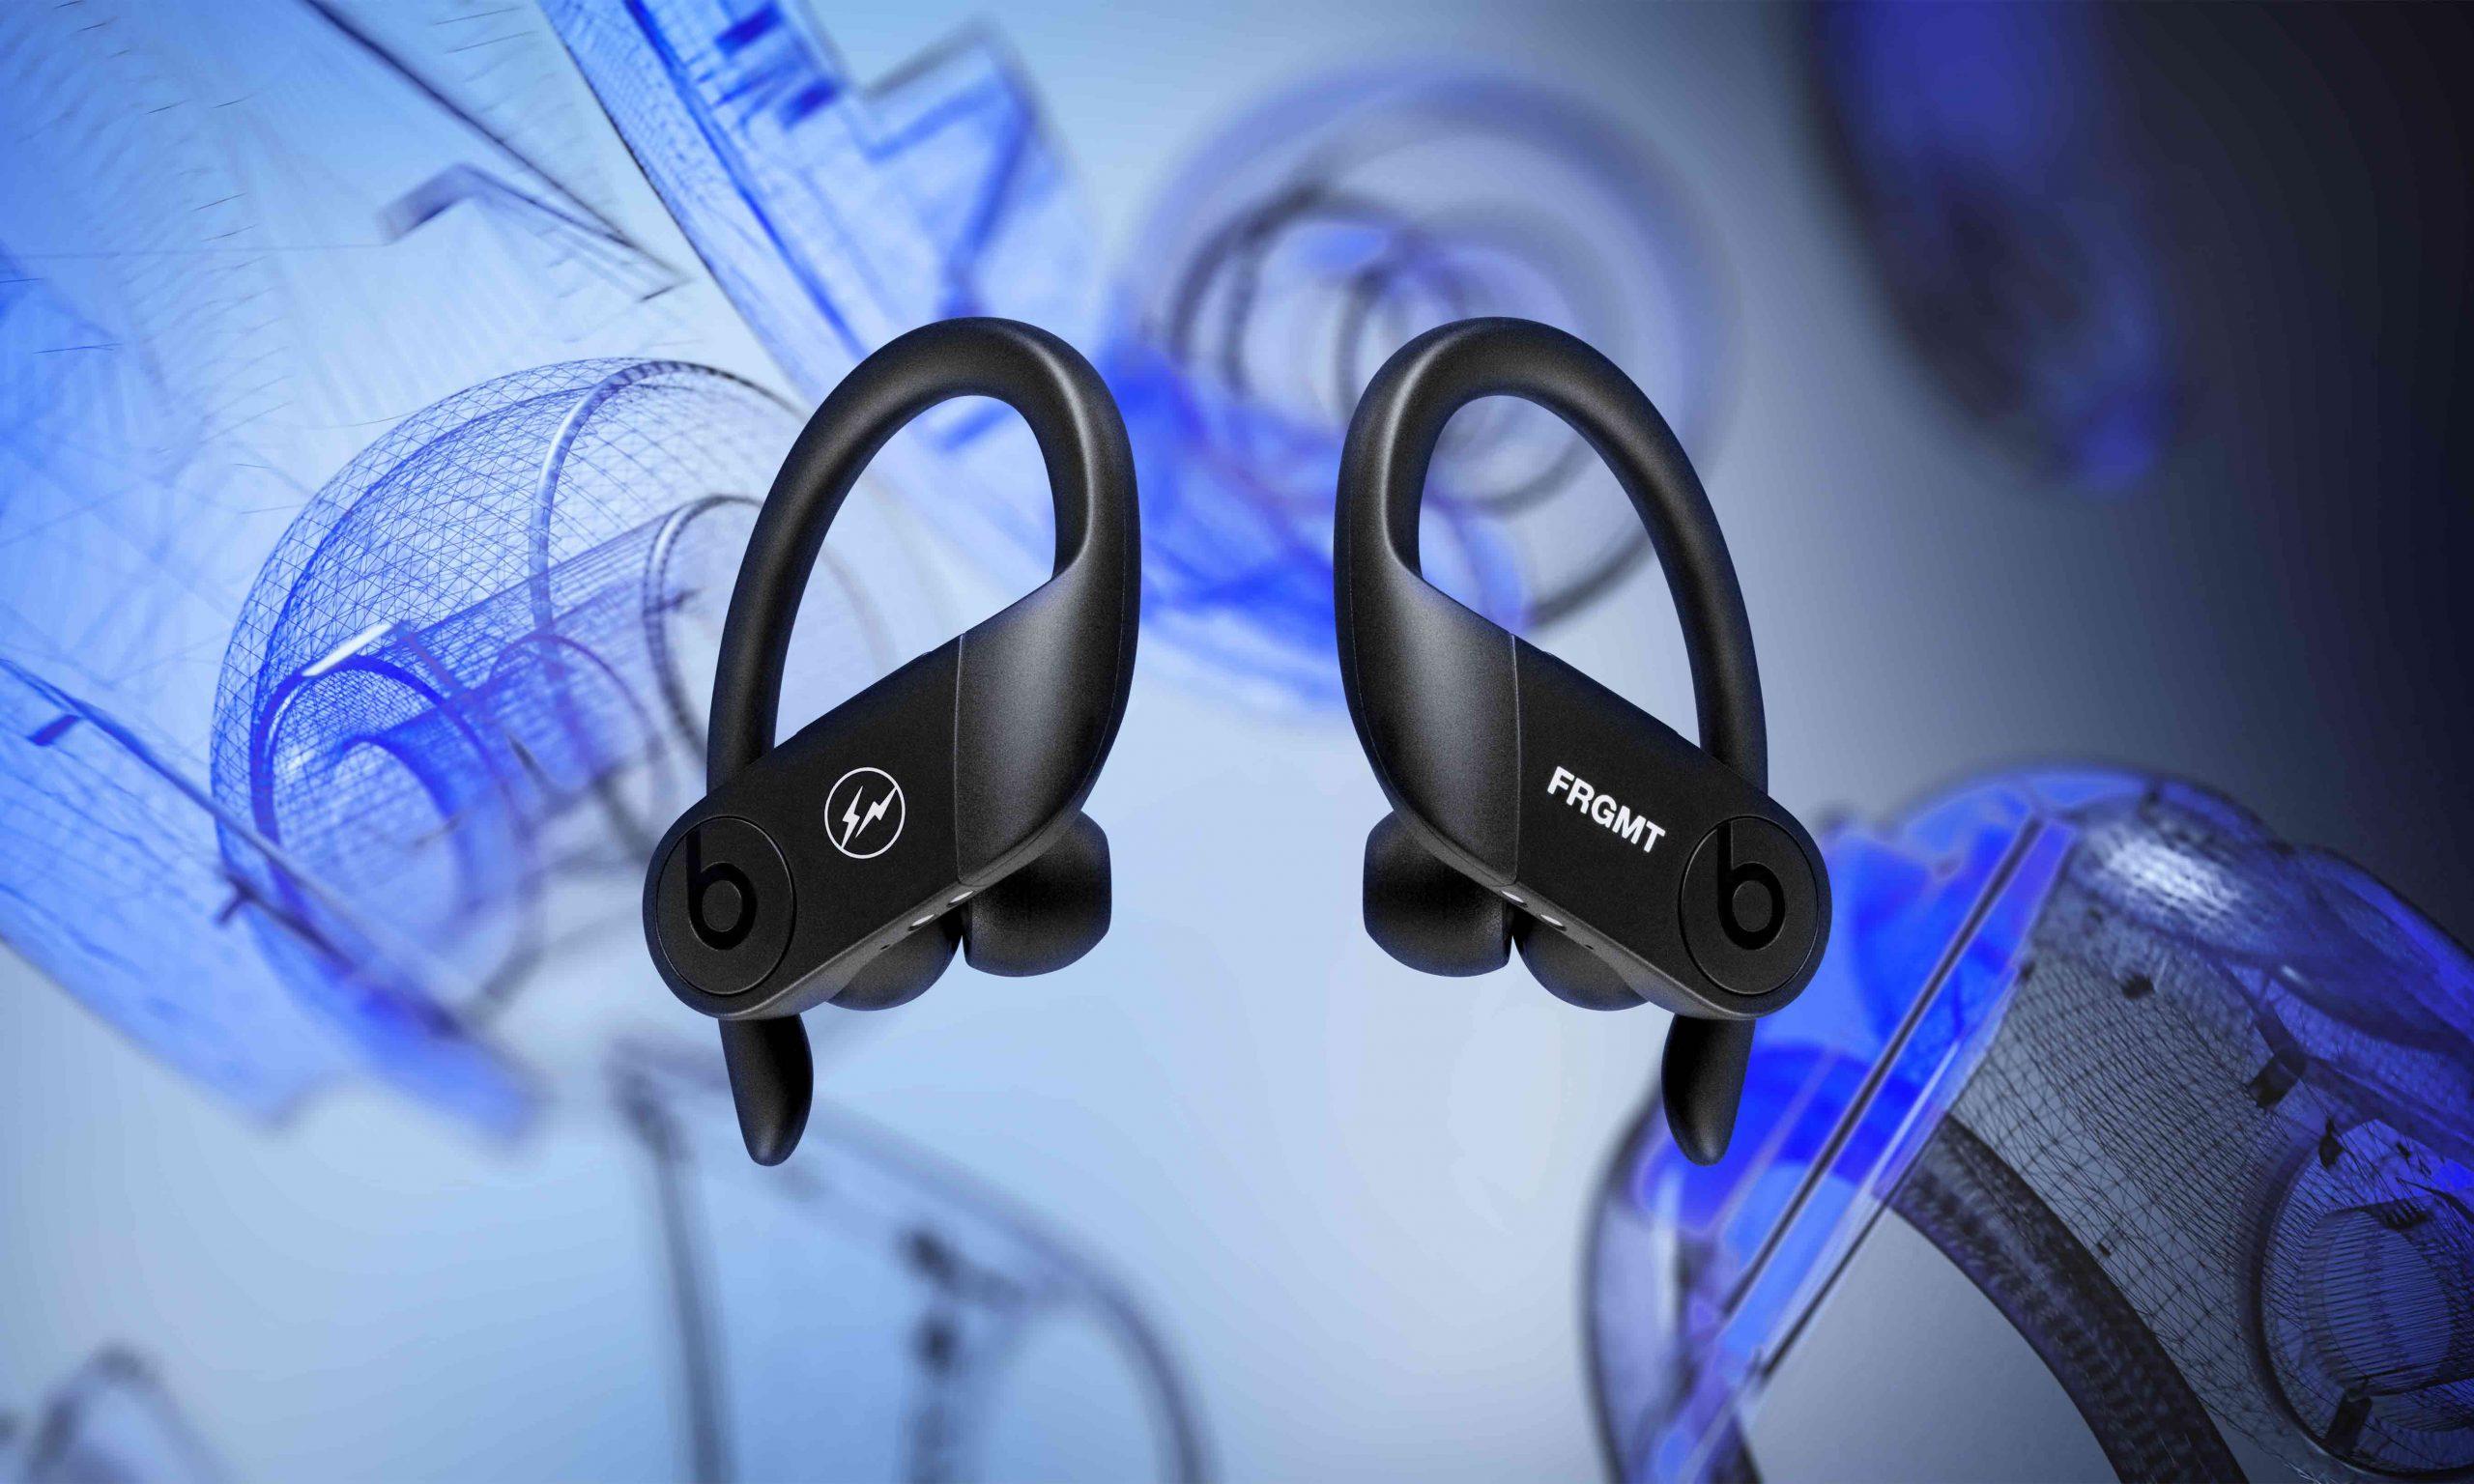 fragment design 以经典单色设计打造 Beats Powerbeats Pro 特别版耳机